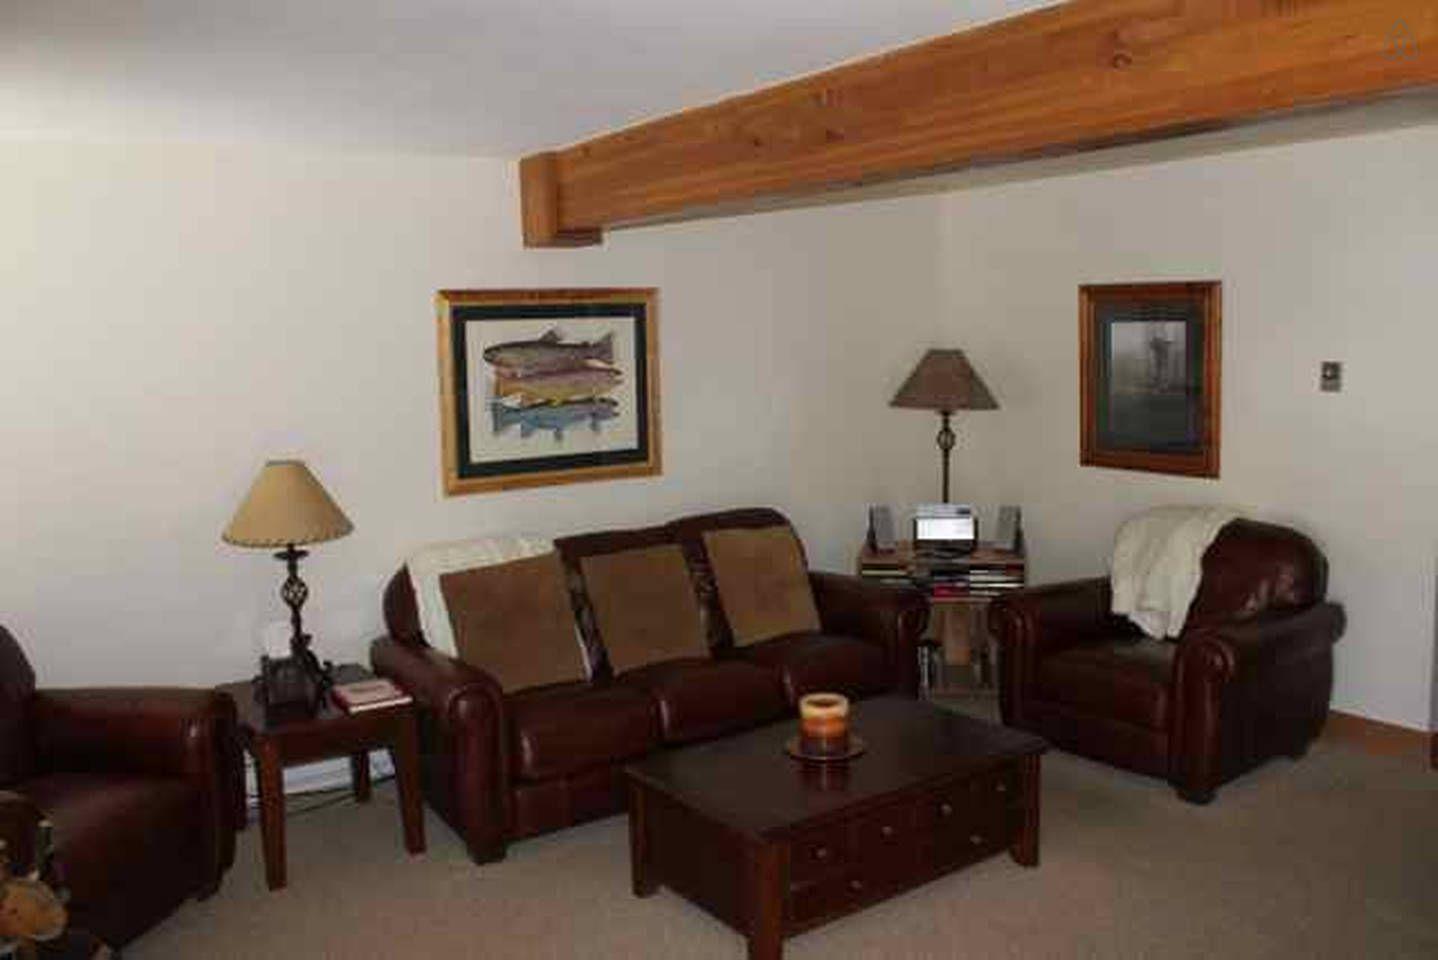 Wanted: Full Time Dreamers! - vacation rental in Breckenridge, Colorado. View more: #BreckenridgeColoradoVacationRentals